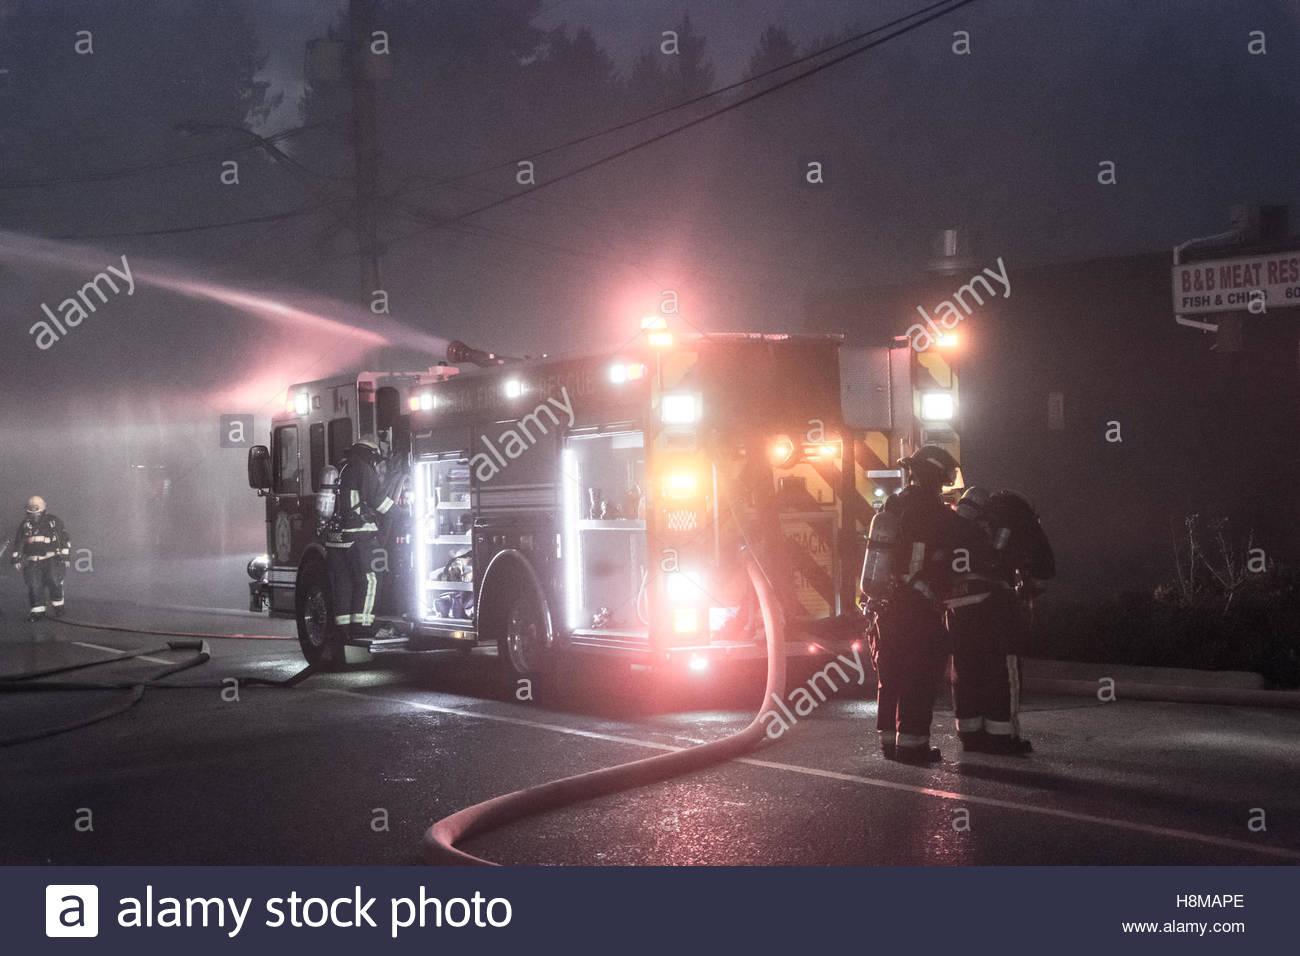 Fire engine - Stock Image